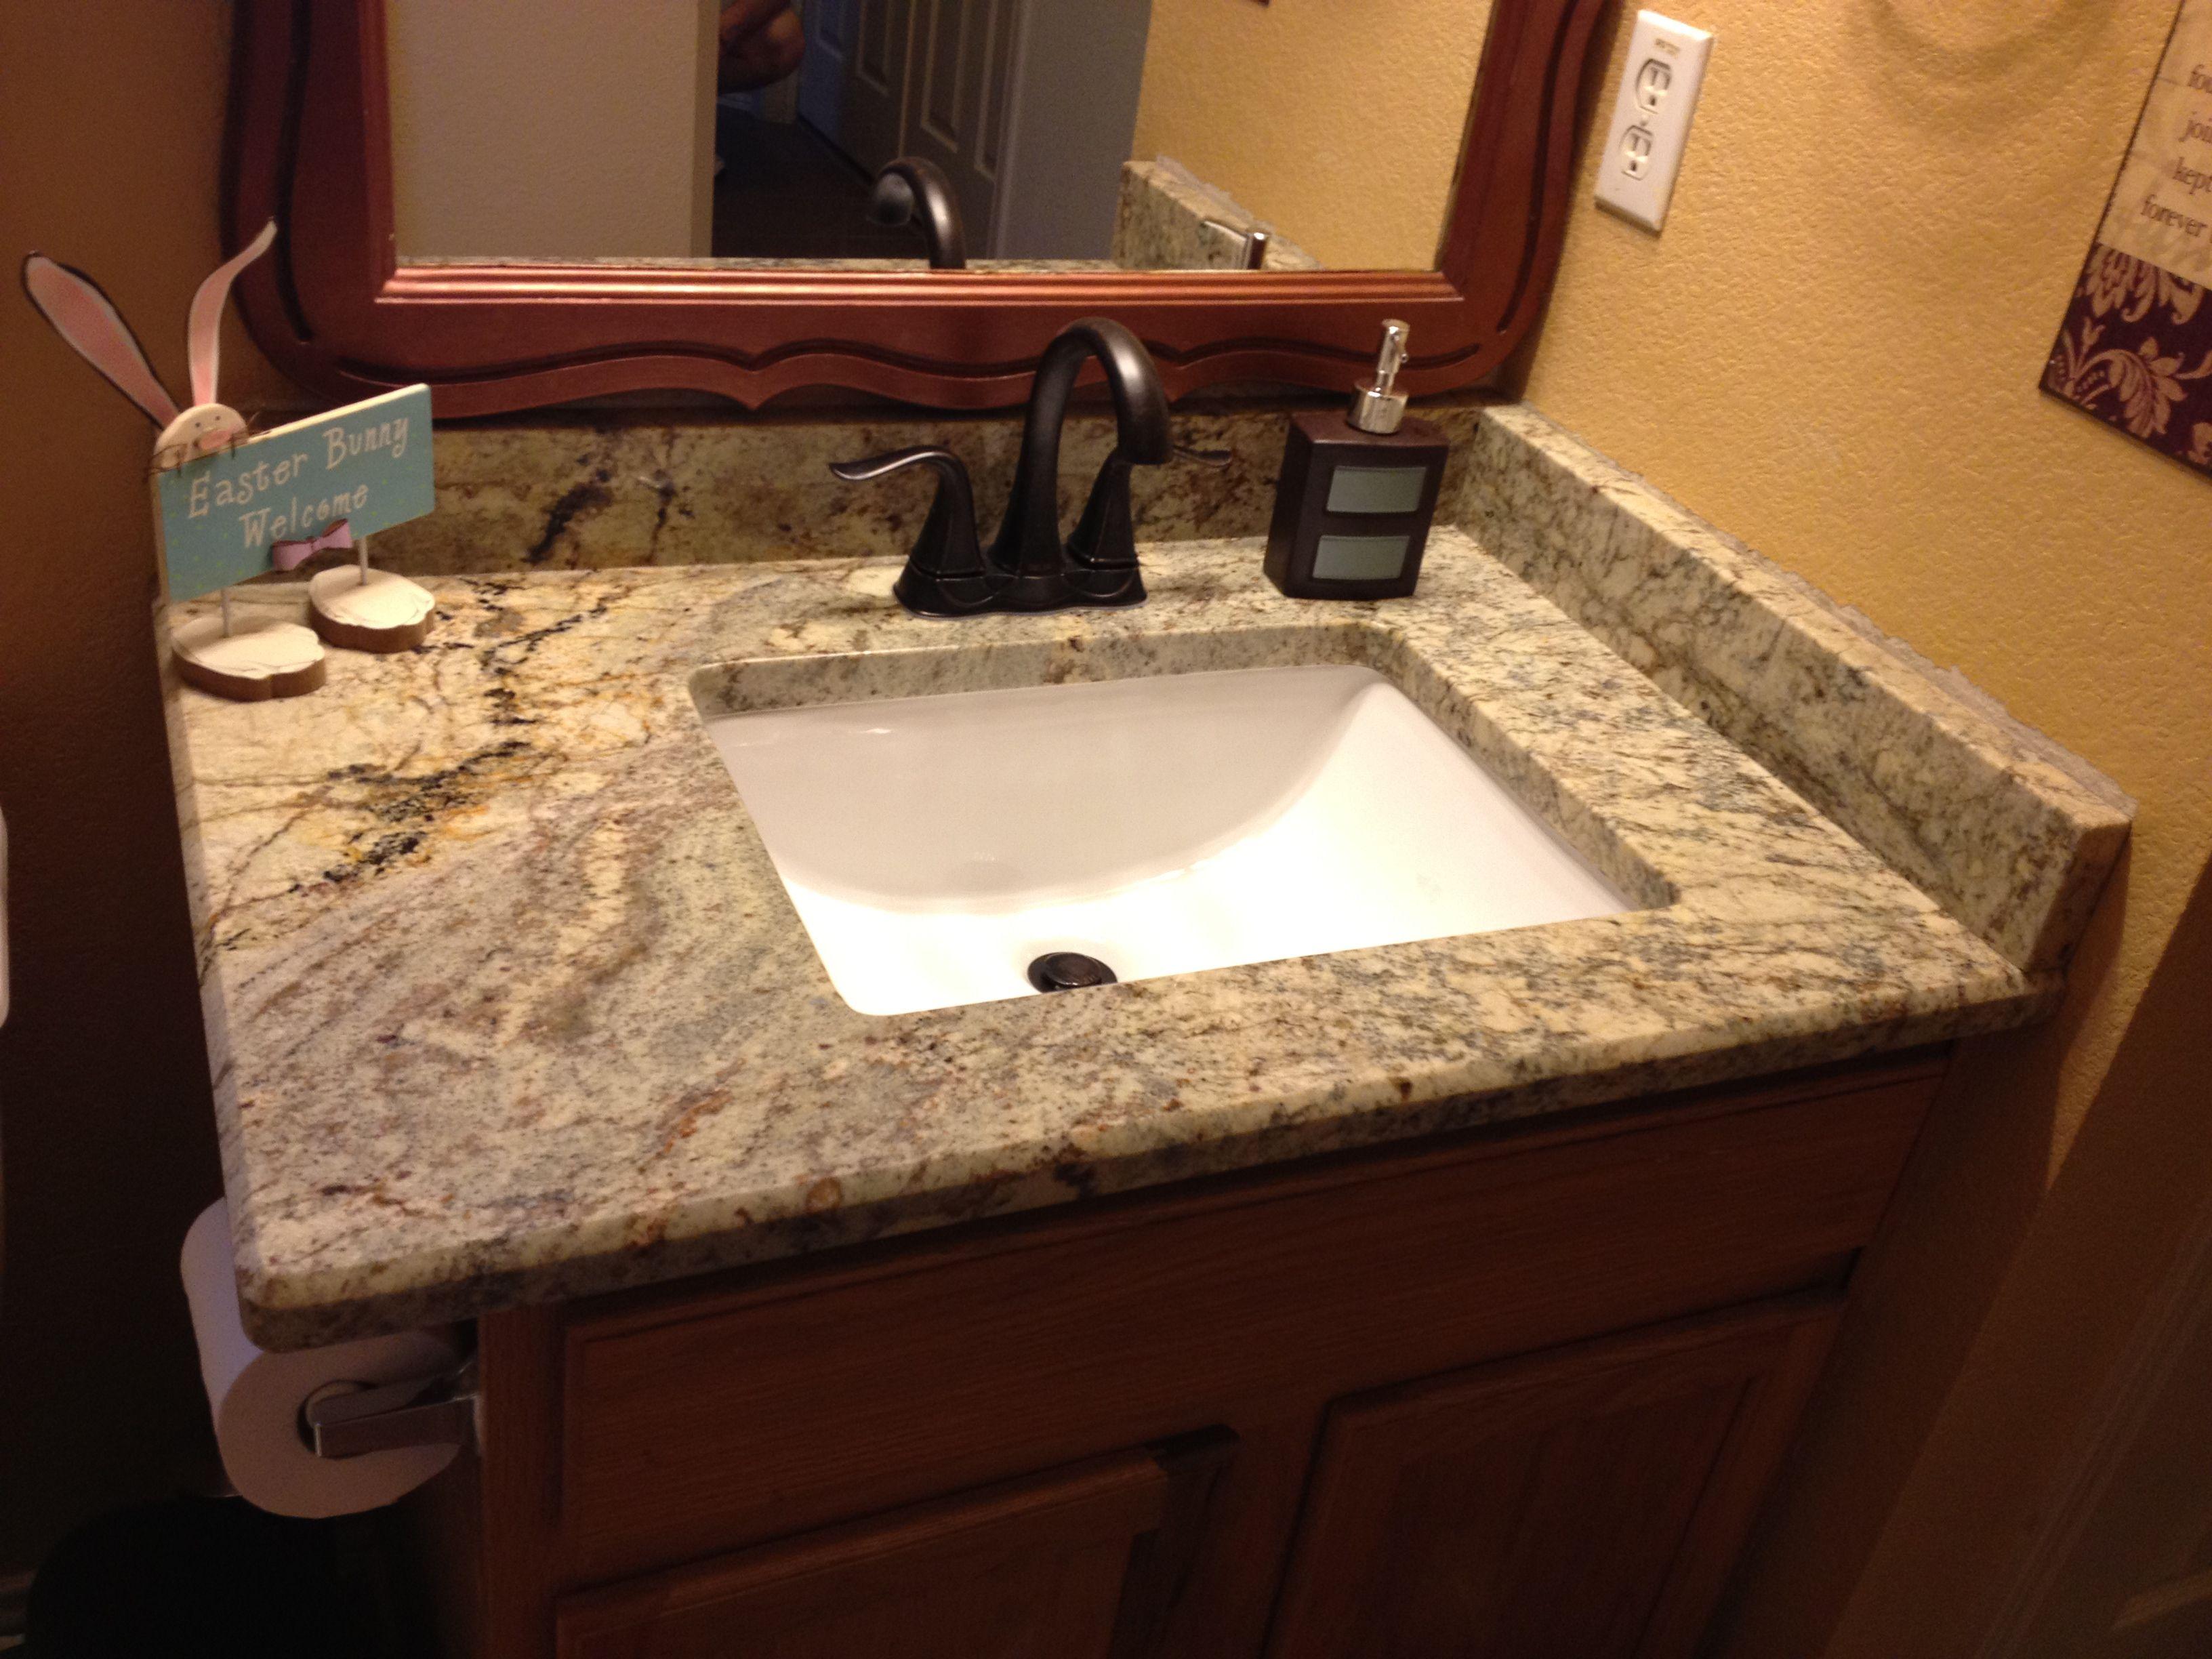 Square Undermount Sink With Granite Counter Bathroom Vanity